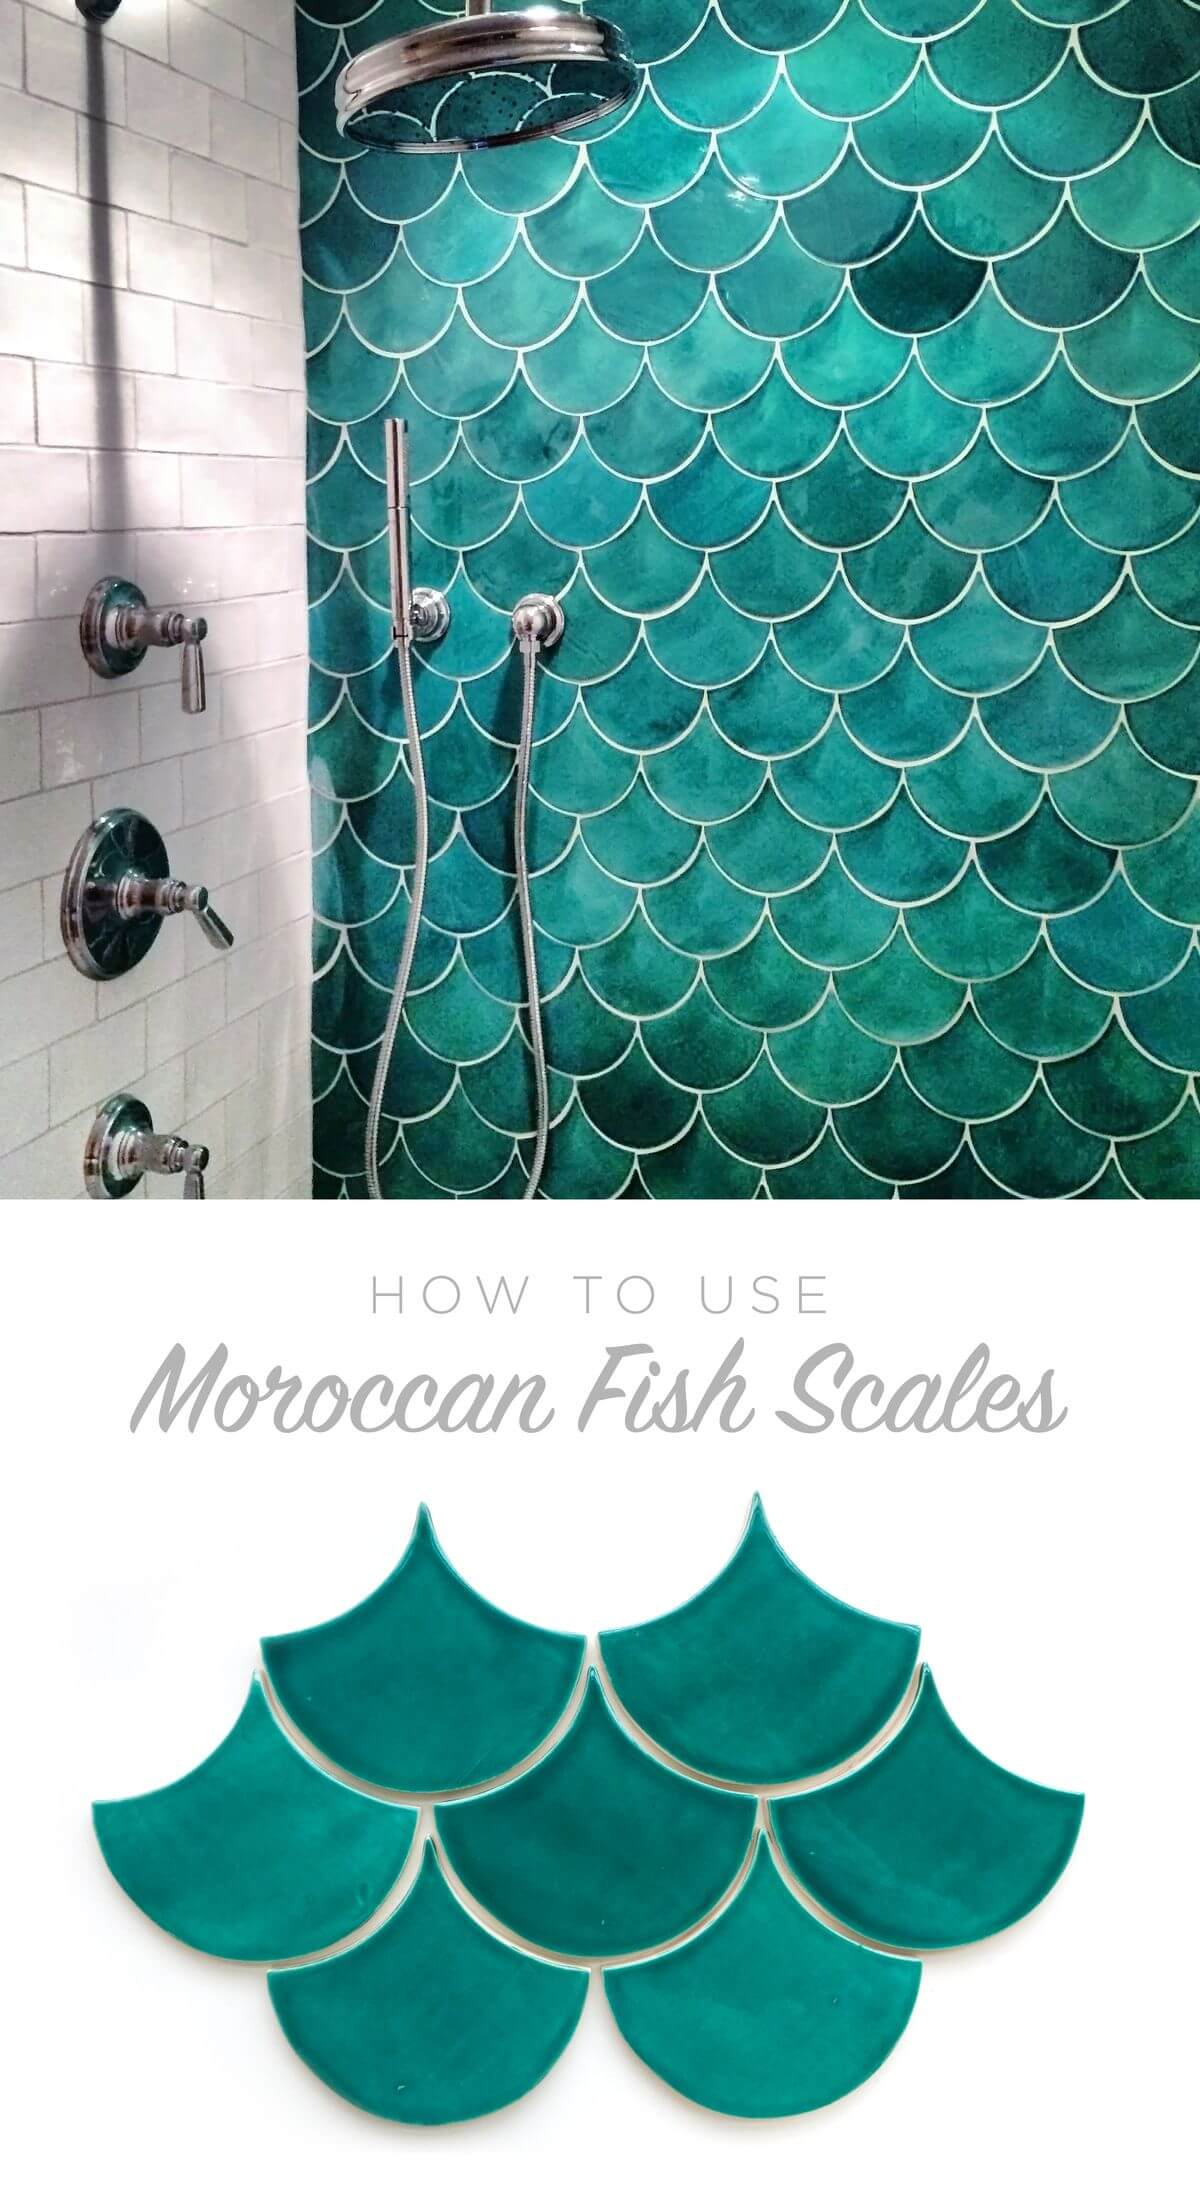 Moroccan Mermaid Fish Scale Tiles